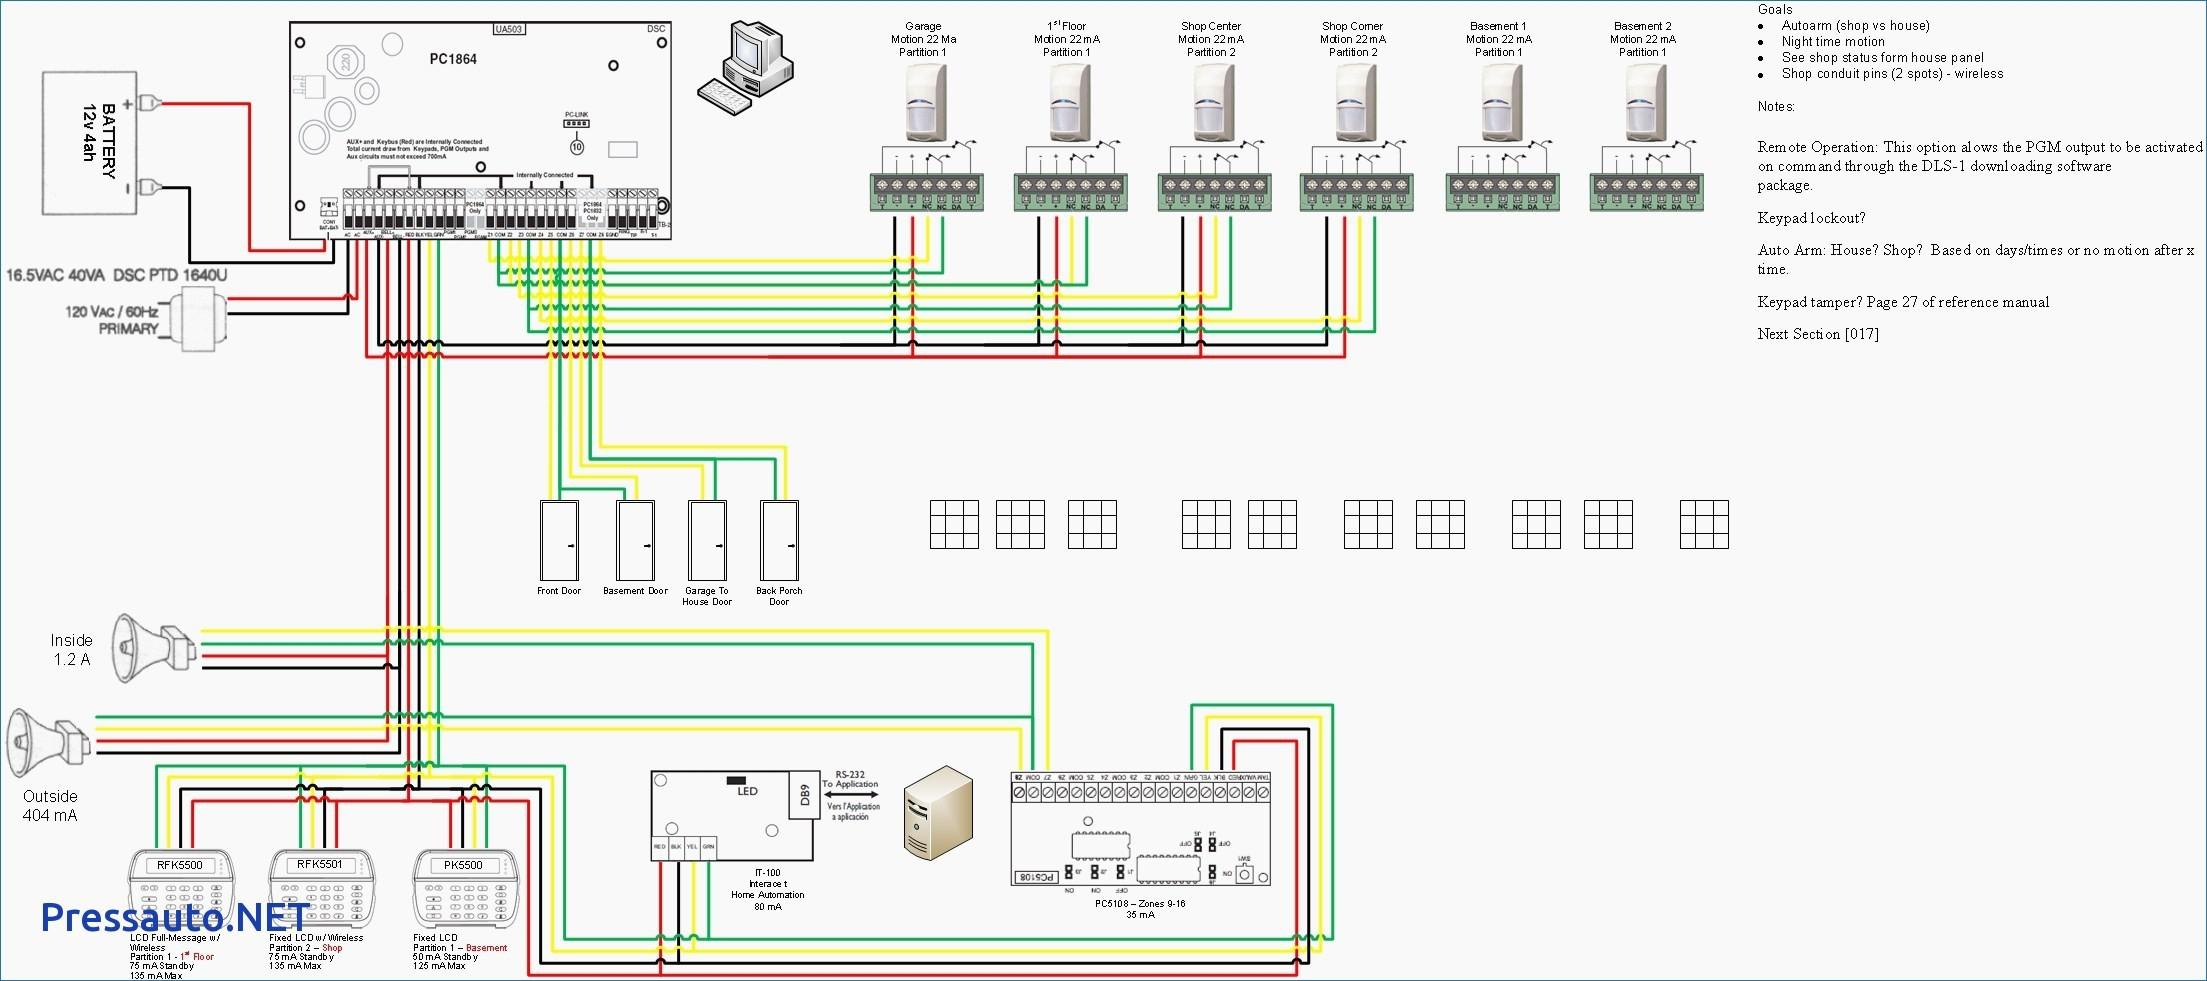 Bulldog Security Rs83B Remote Start Wiring Diagram | Wiring Library - Bulldog Security Wiring Diagram